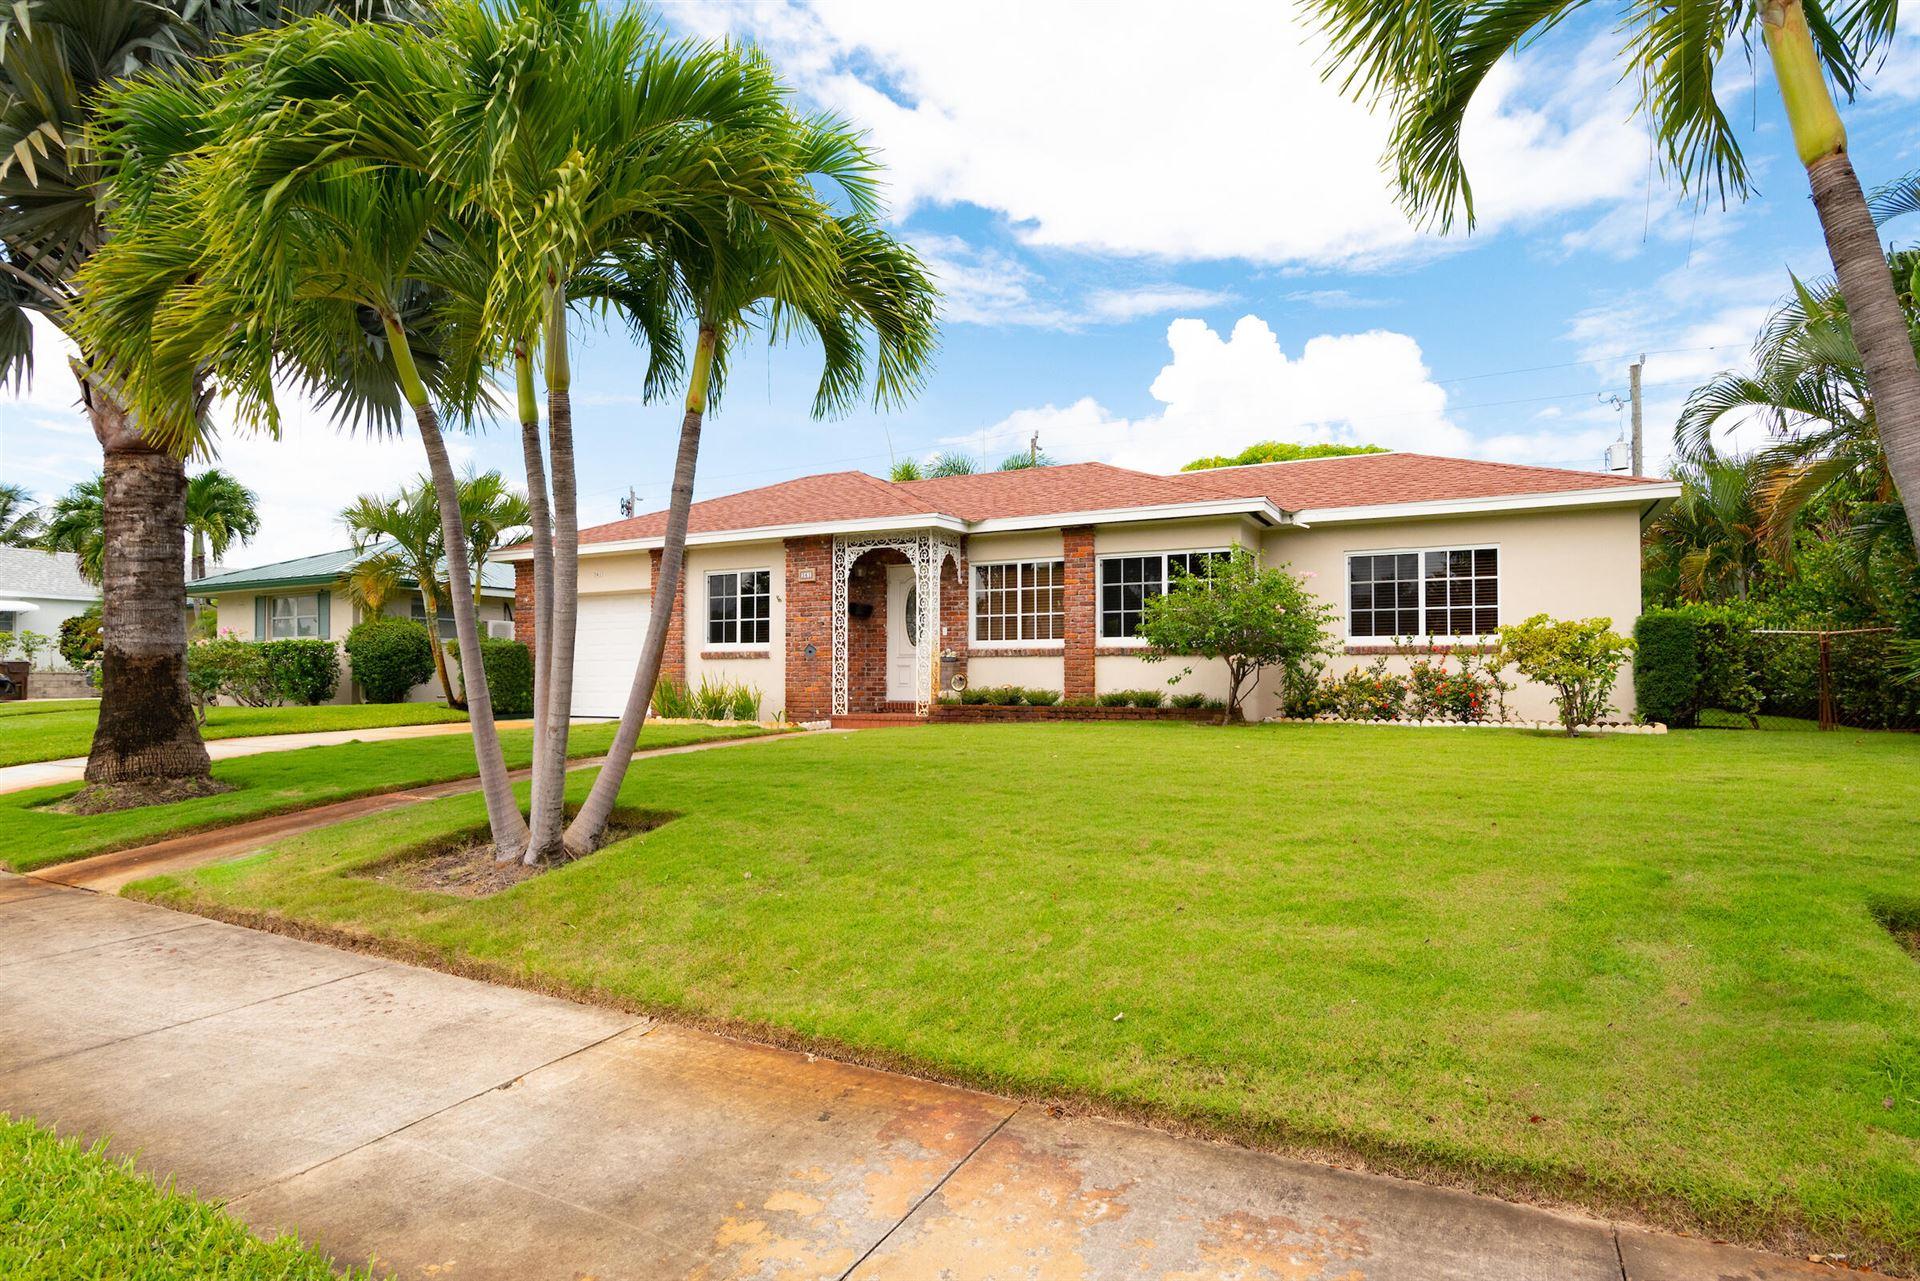 Photo of 361 Franklin Road, West Palm Beach, FL 33405 (MLS # RX-10746267)